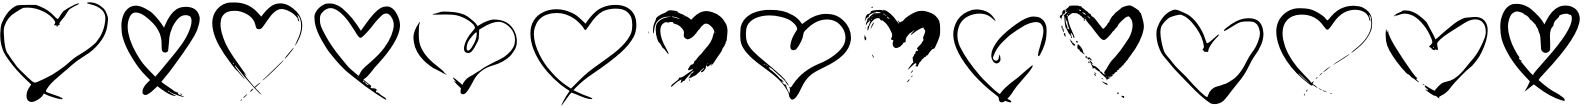 BM Graphics Hearts